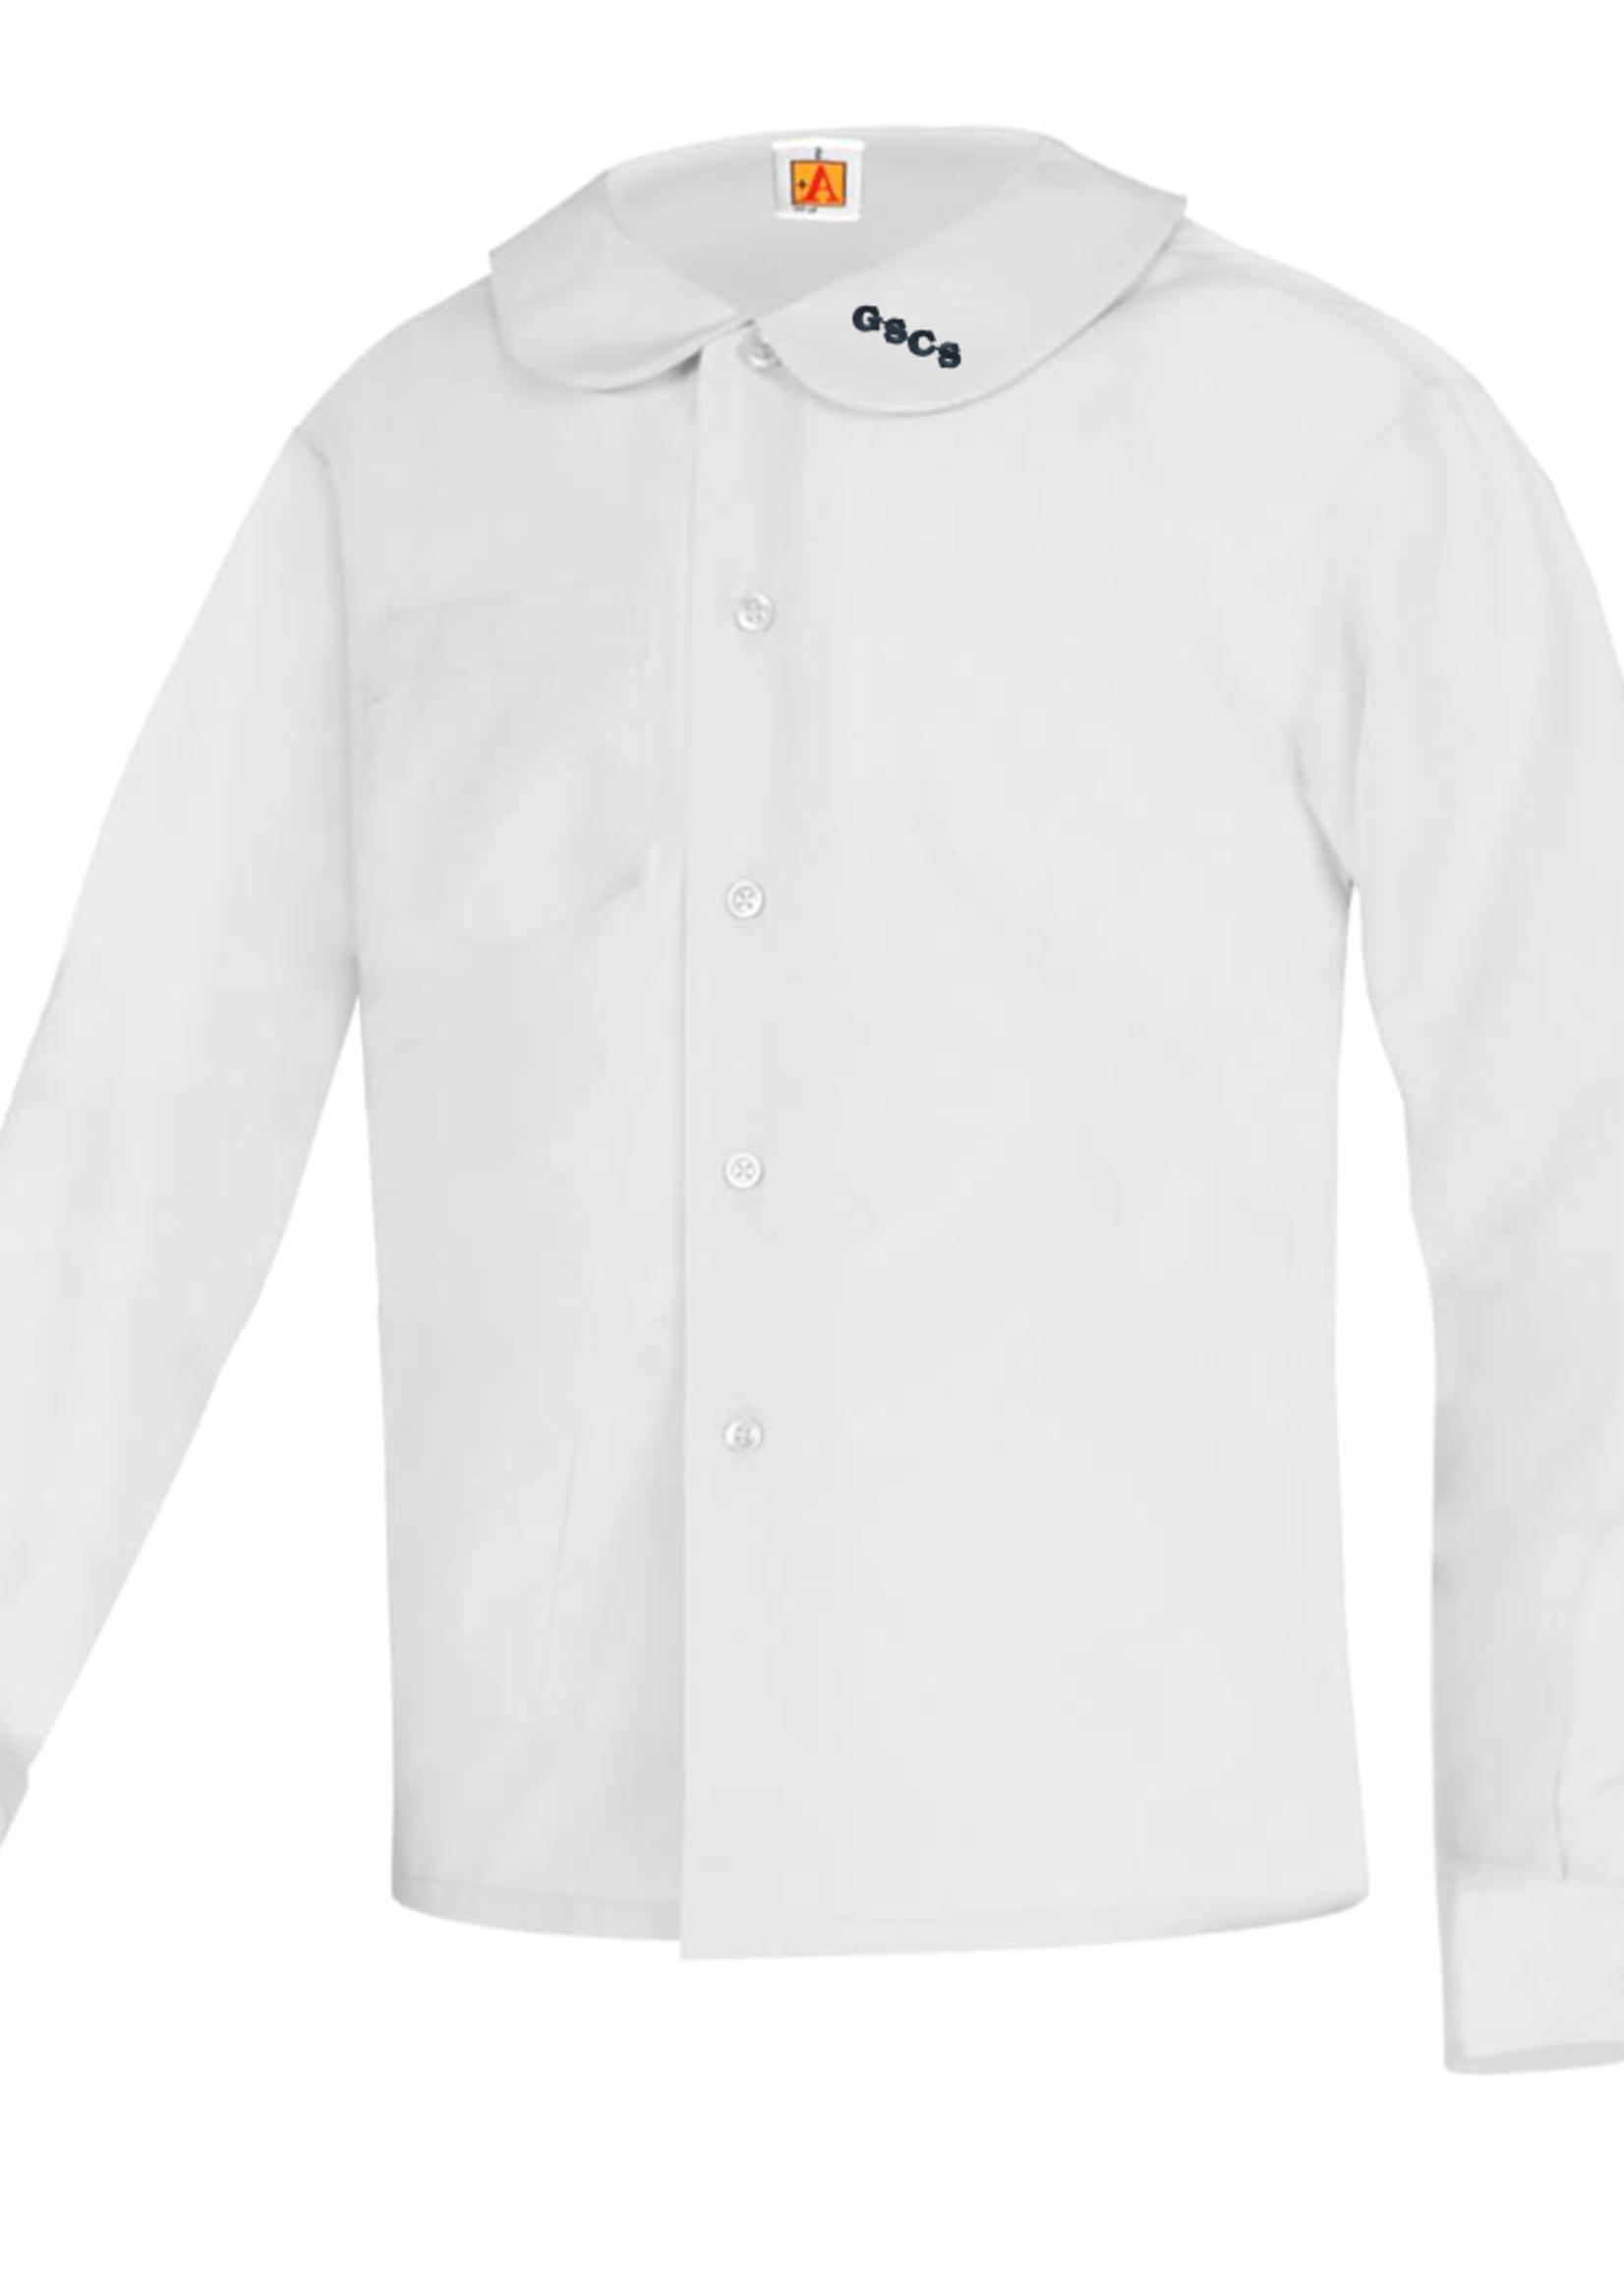 TUS GSCS White Long Sleeve Peter Pan Blouse w/o Pocket